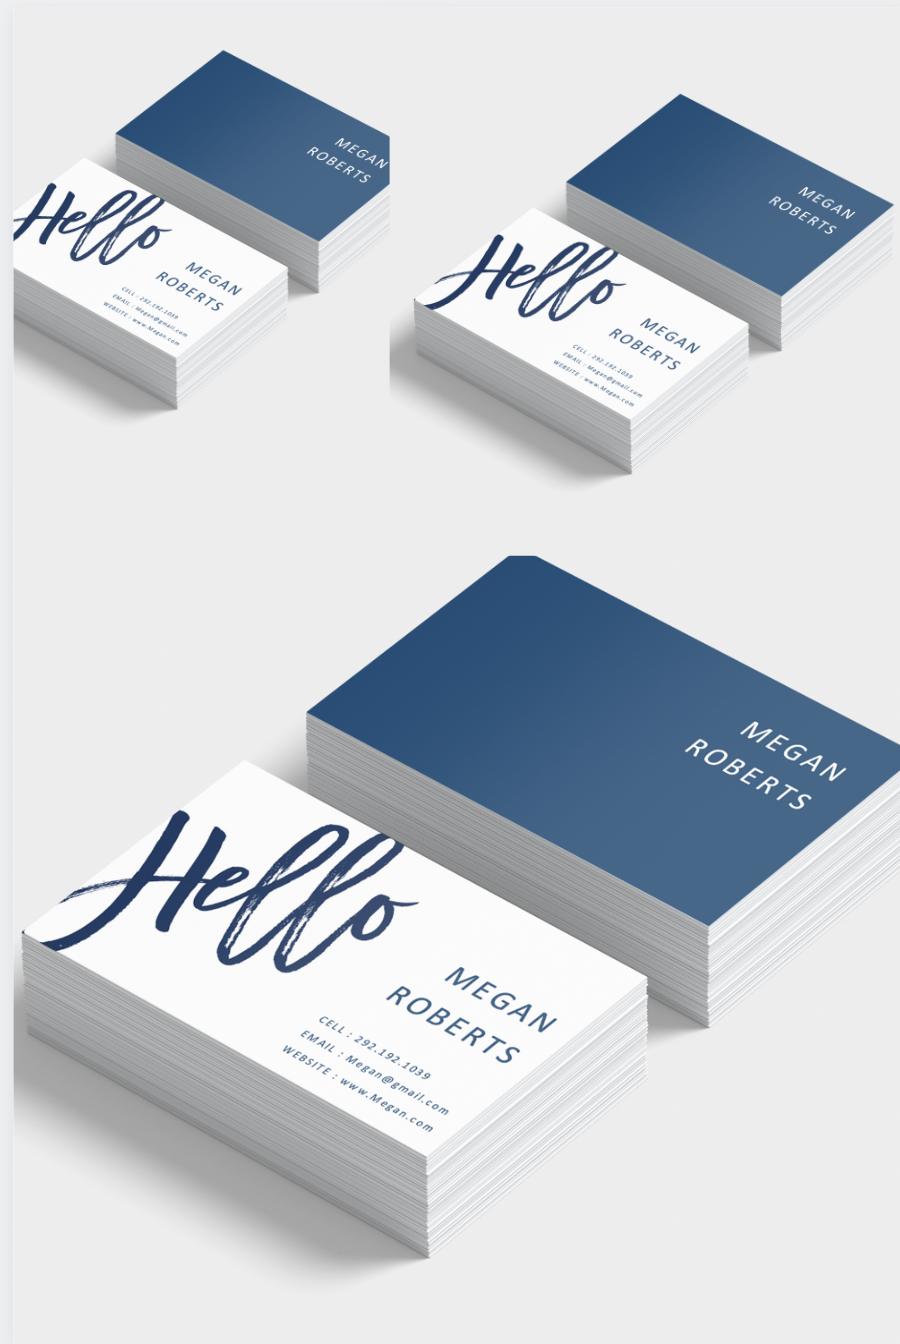 Editable Business Card Templates Diy Business Card Template Modern And Professional Business Cards Diy Templates Calling Card Design Business Card Template